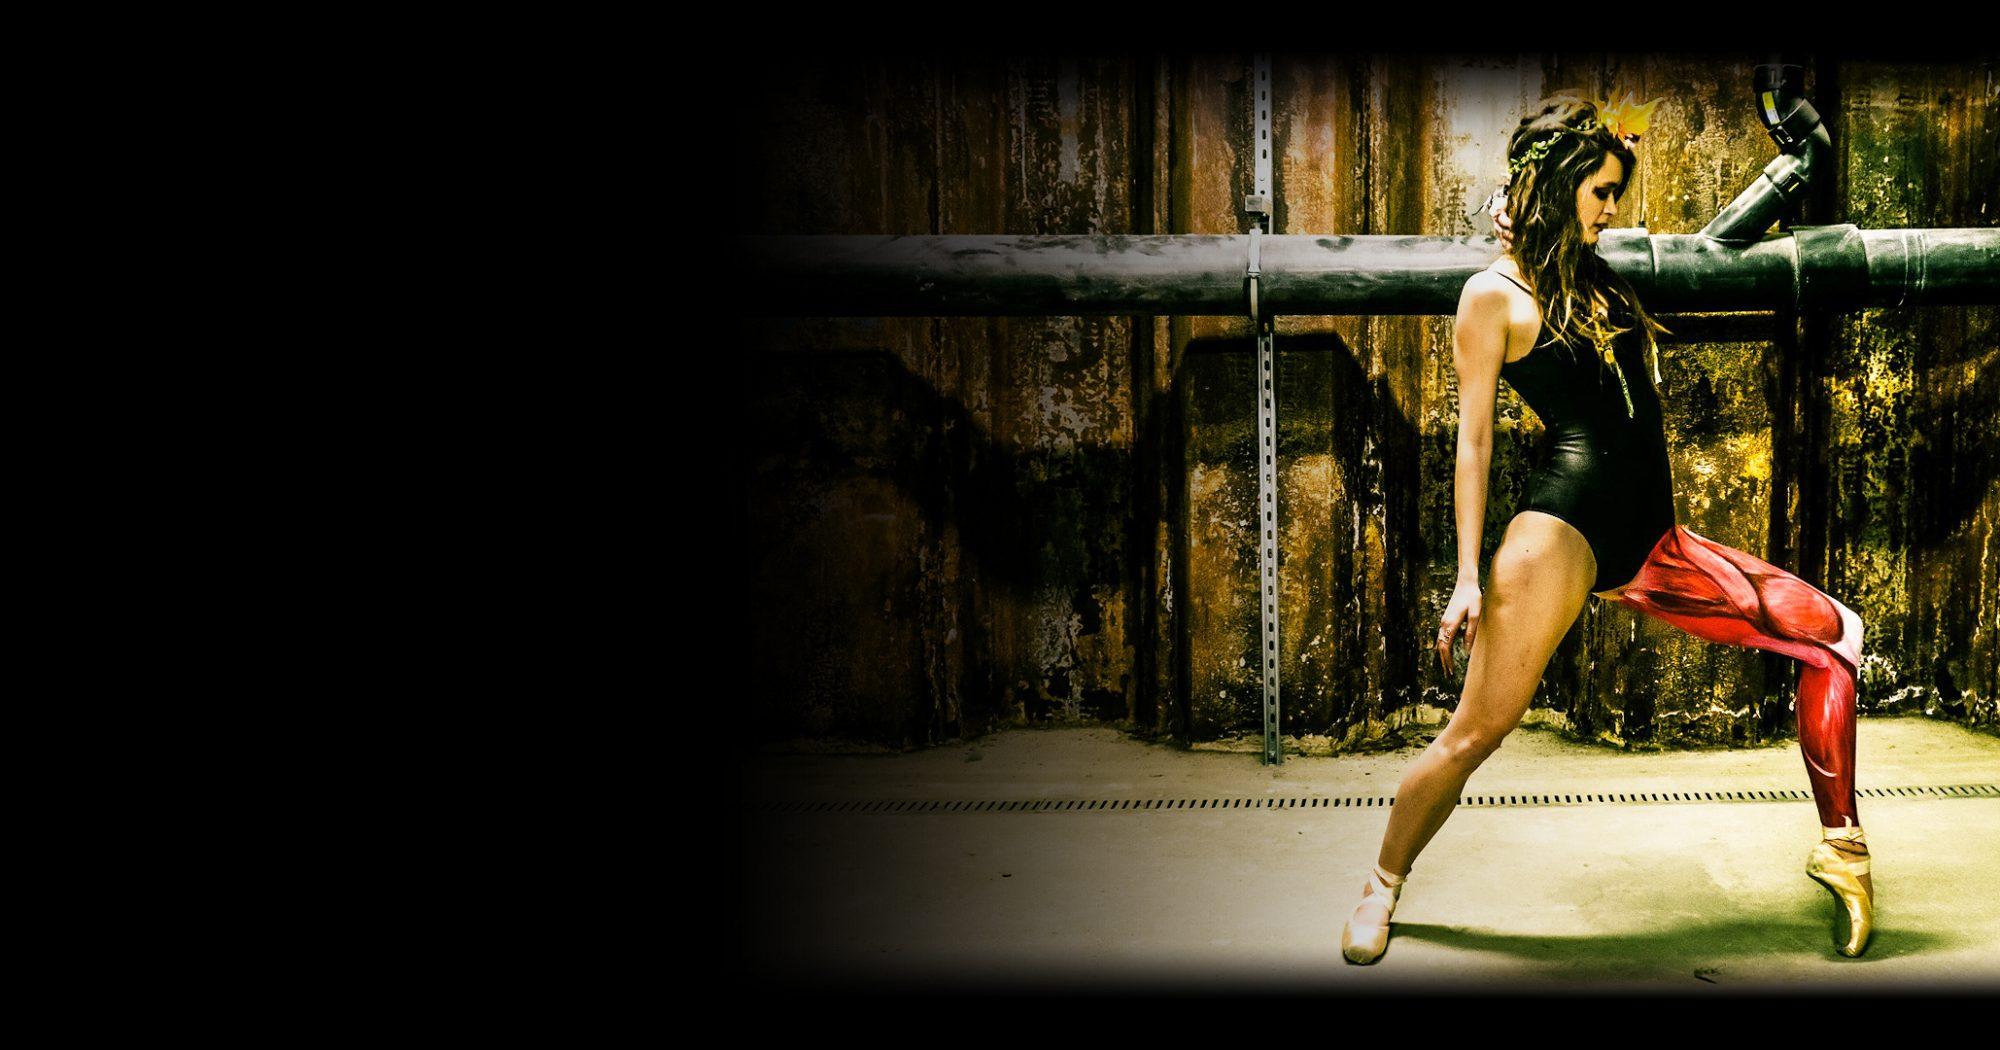 Ballet dancer model with bodypainted leg muscles